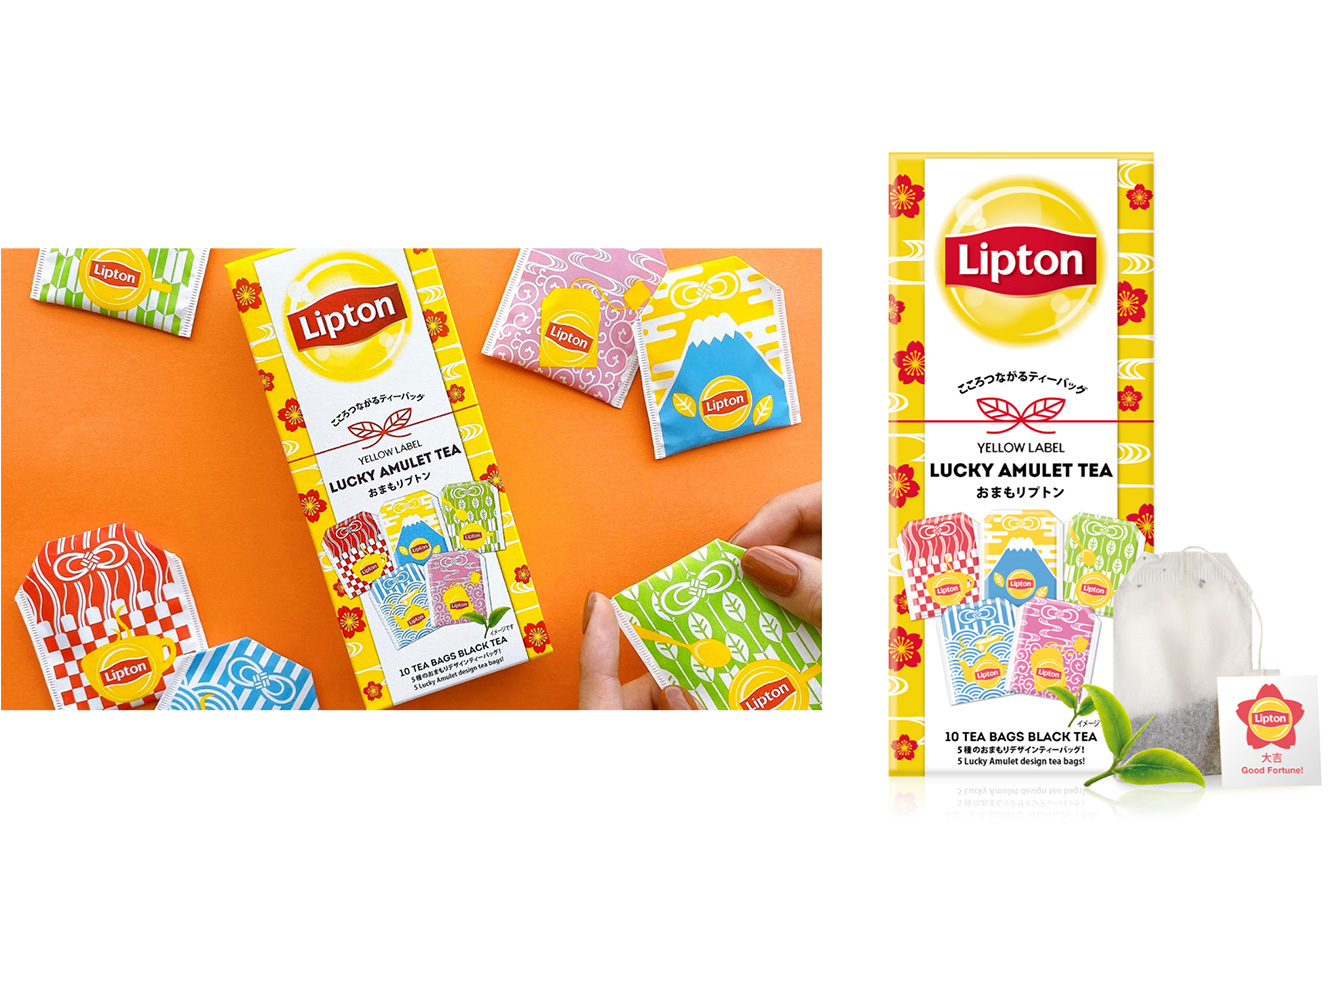 Unilever Japan K.K.